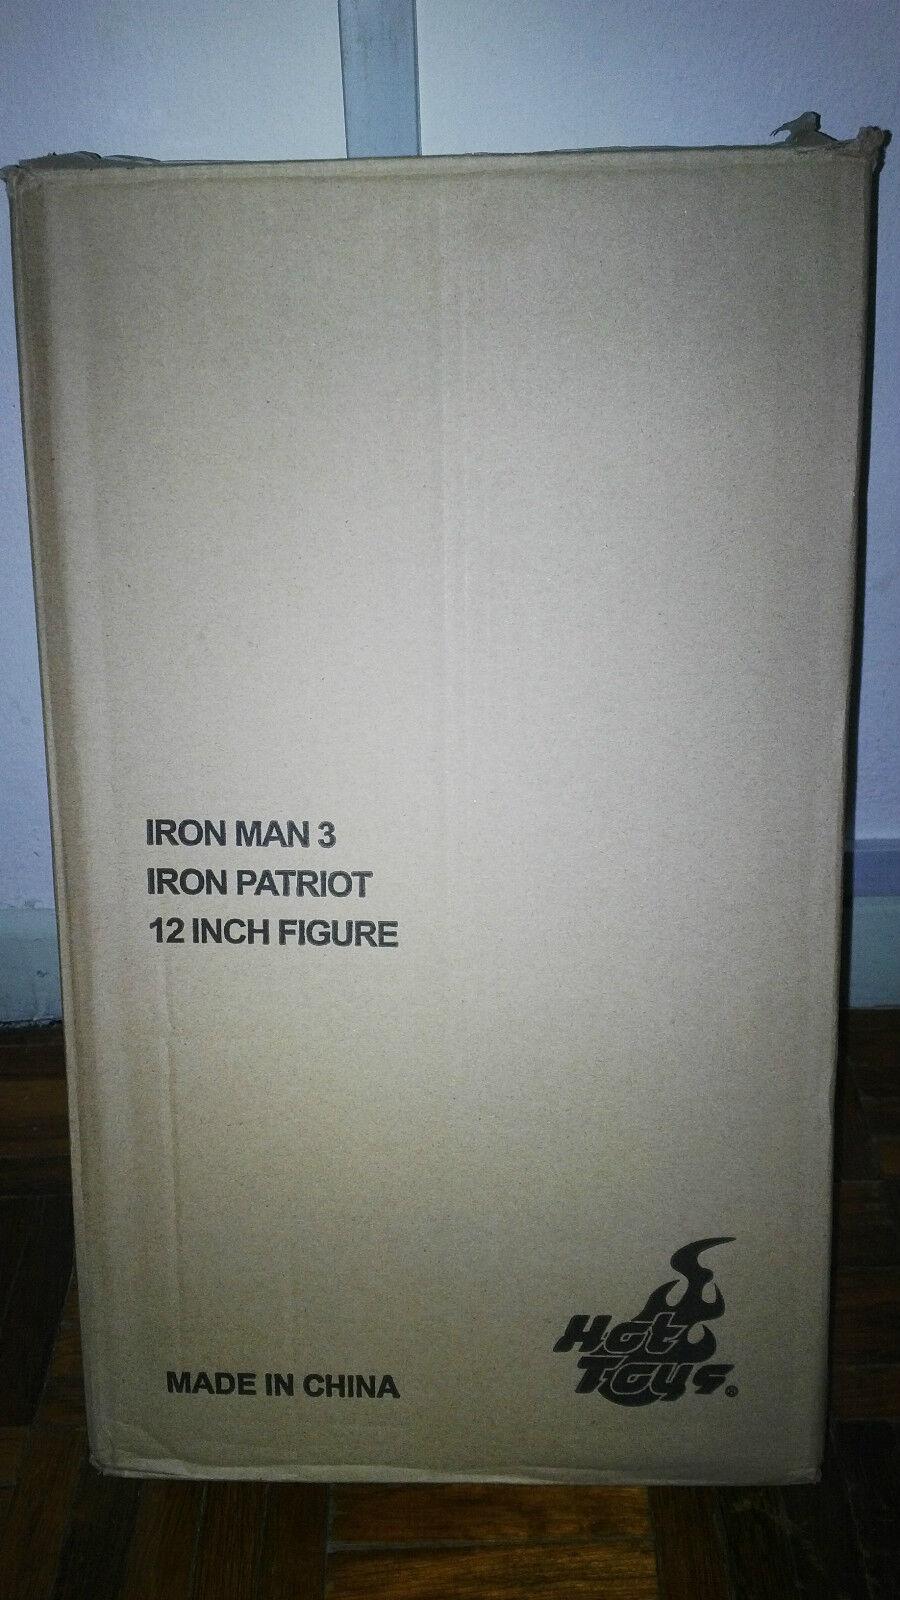 Hot Toys Iron Iron Iron Man 3 III Patriot Diecast Figure 1/6 New Mint in Box MMS195D01 9f2942